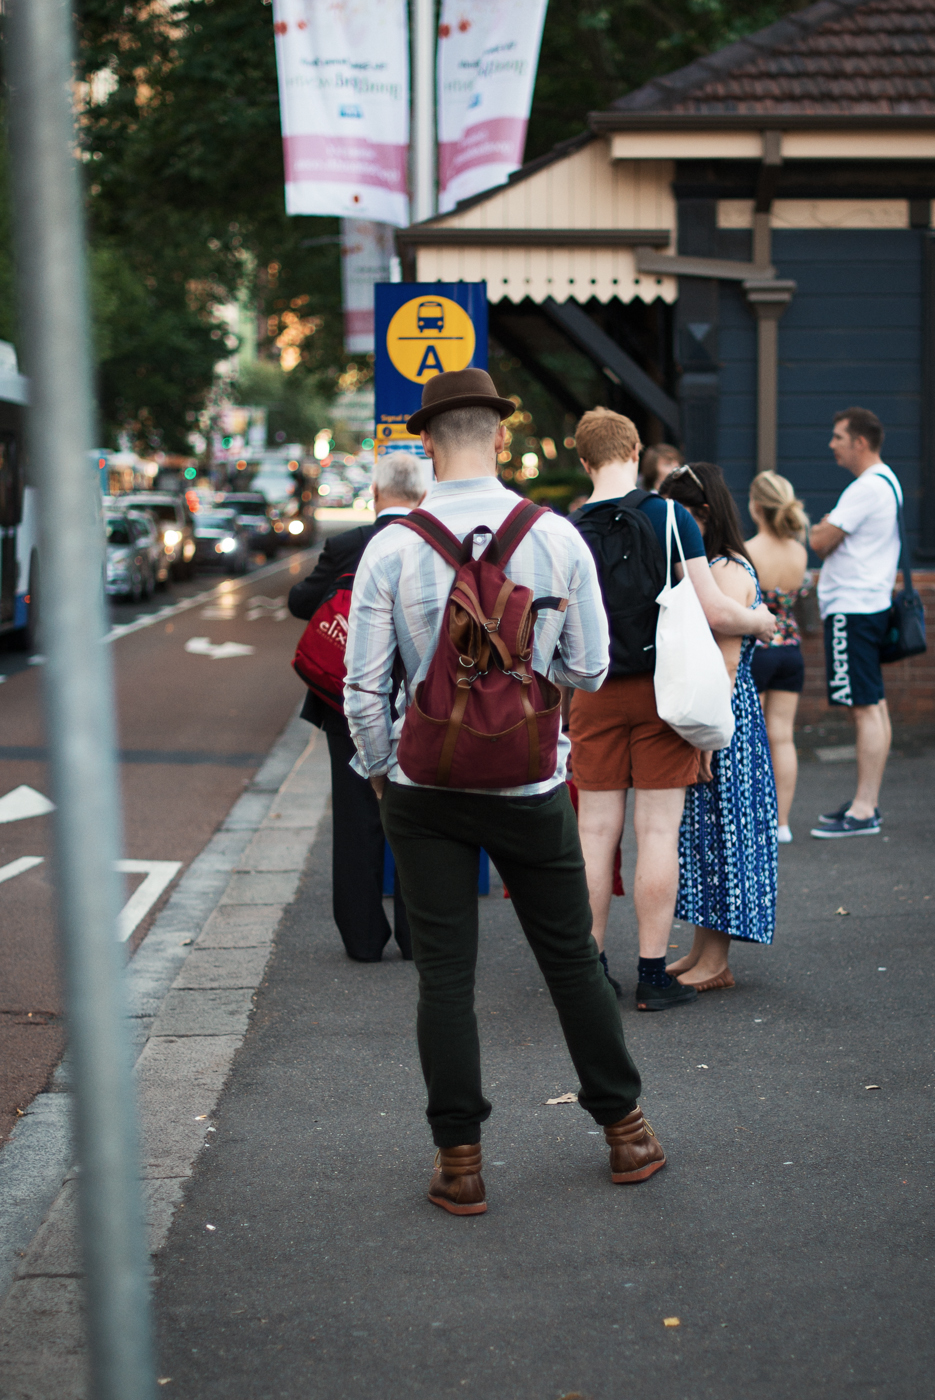 Kettle-curl brim. Similar look:Brixton 'Gain' Homburg Khaki/ Brown Medium.